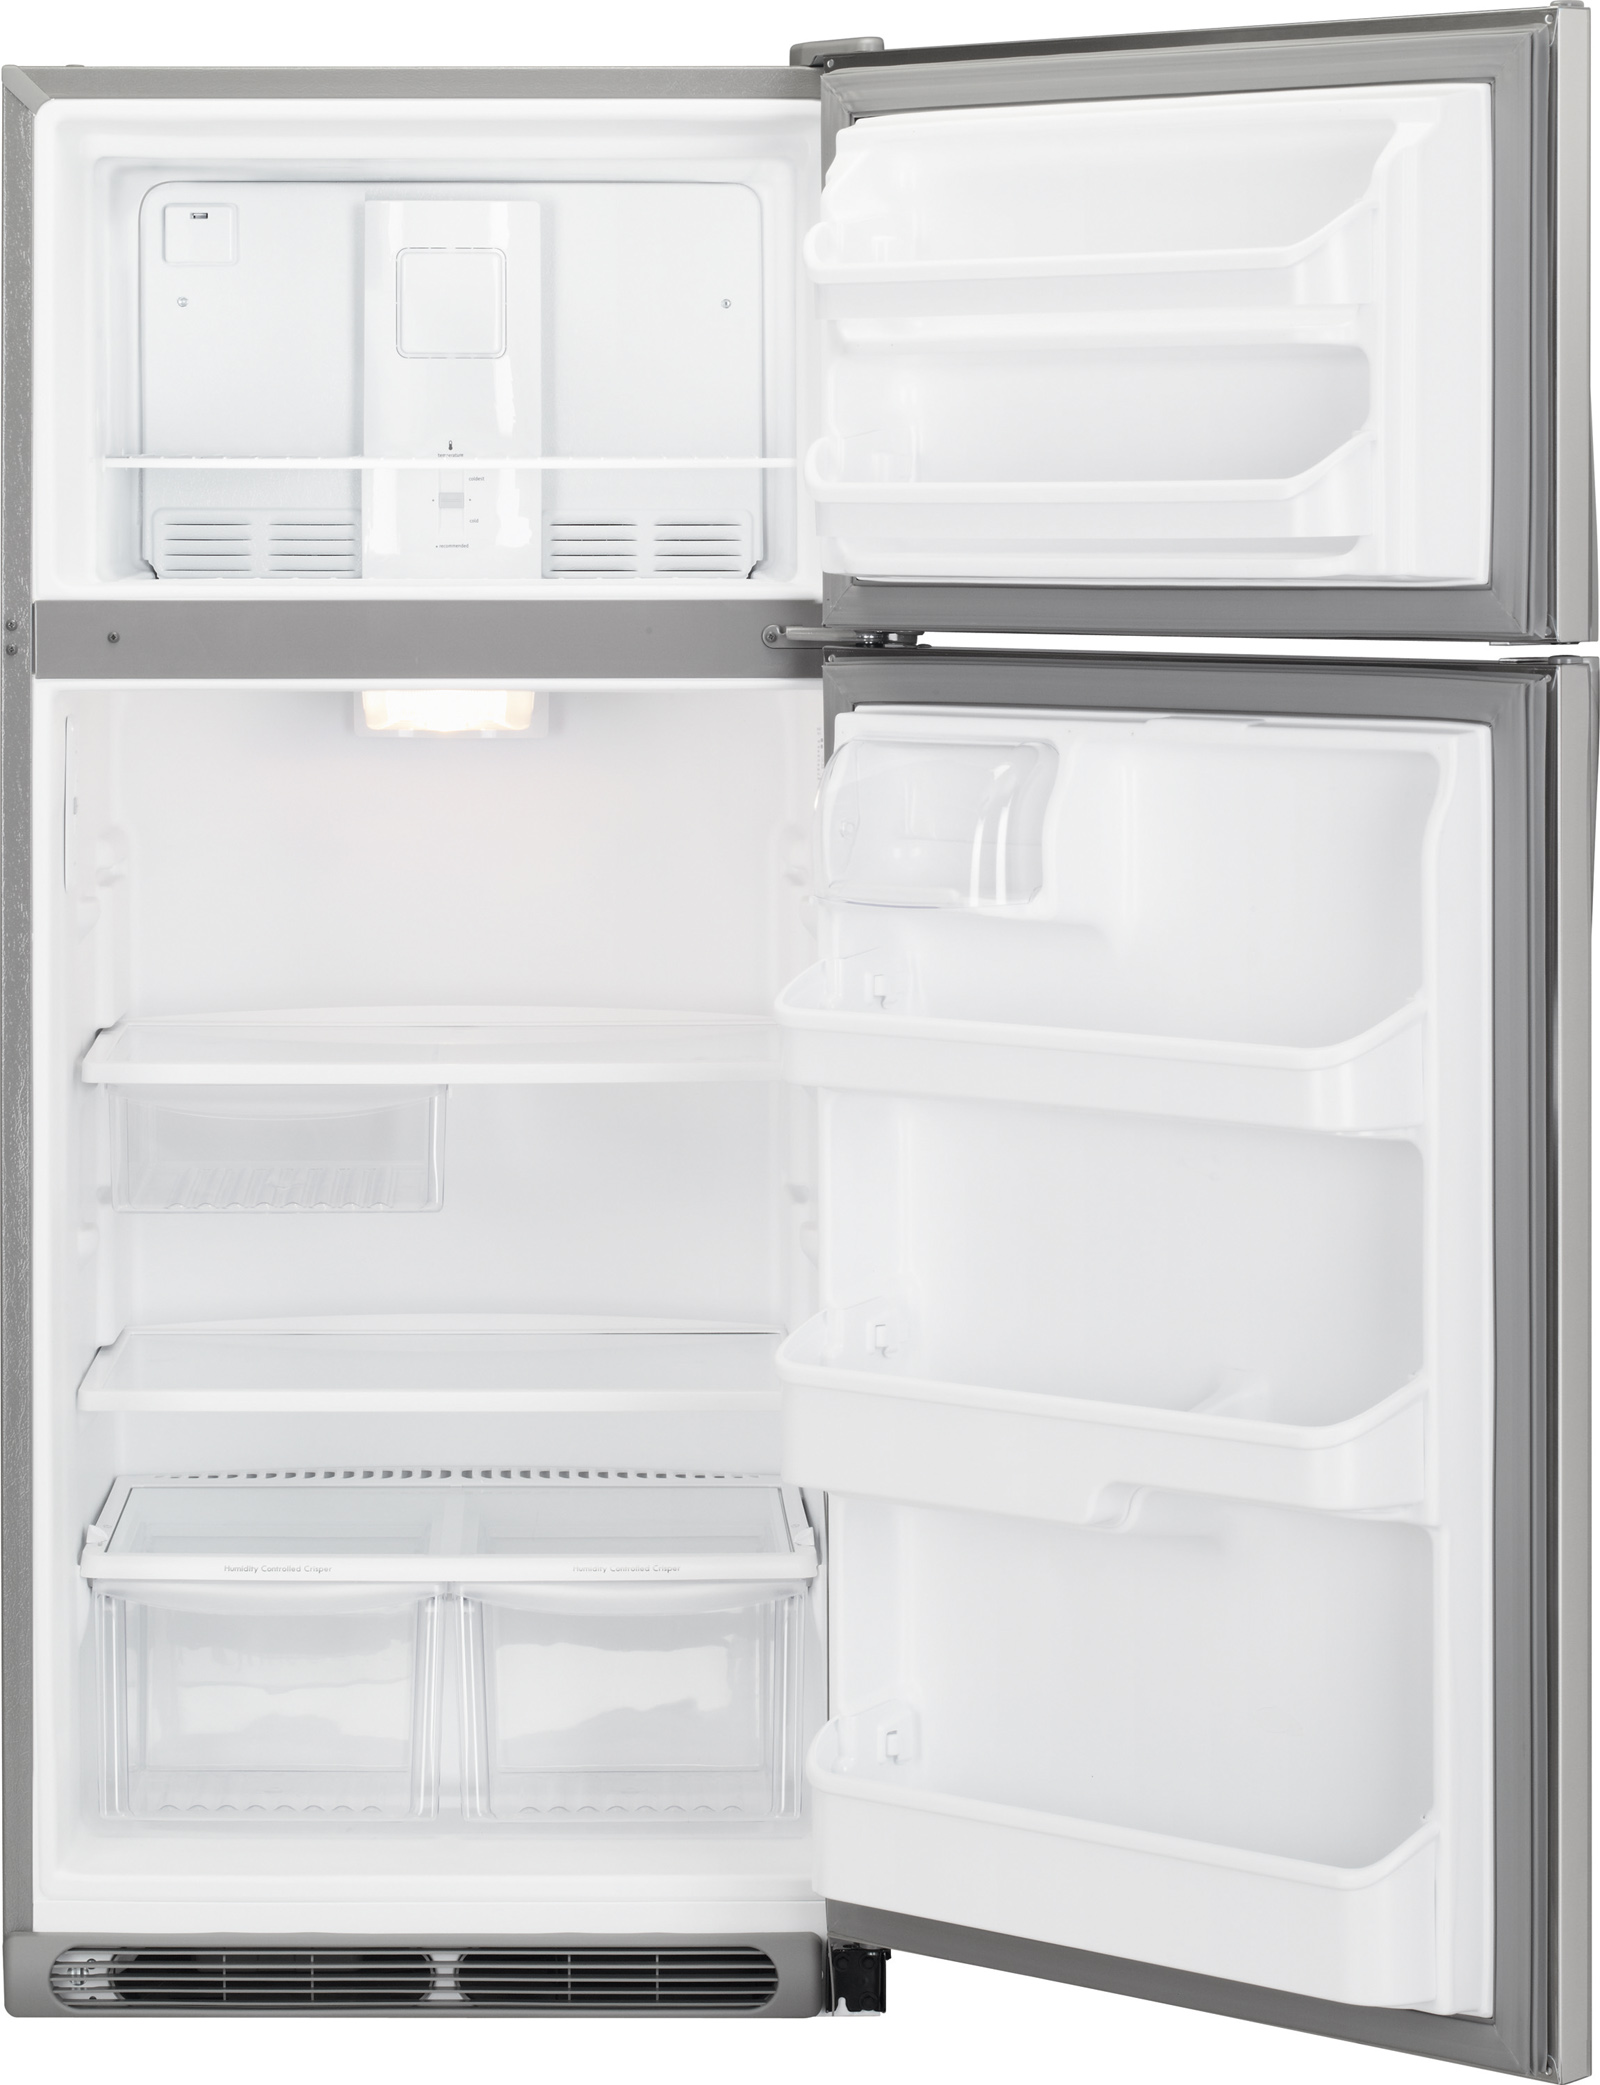 Kenmore 60603 18 cu. ft. Top Freezer Refrigerator - Stainless Steel